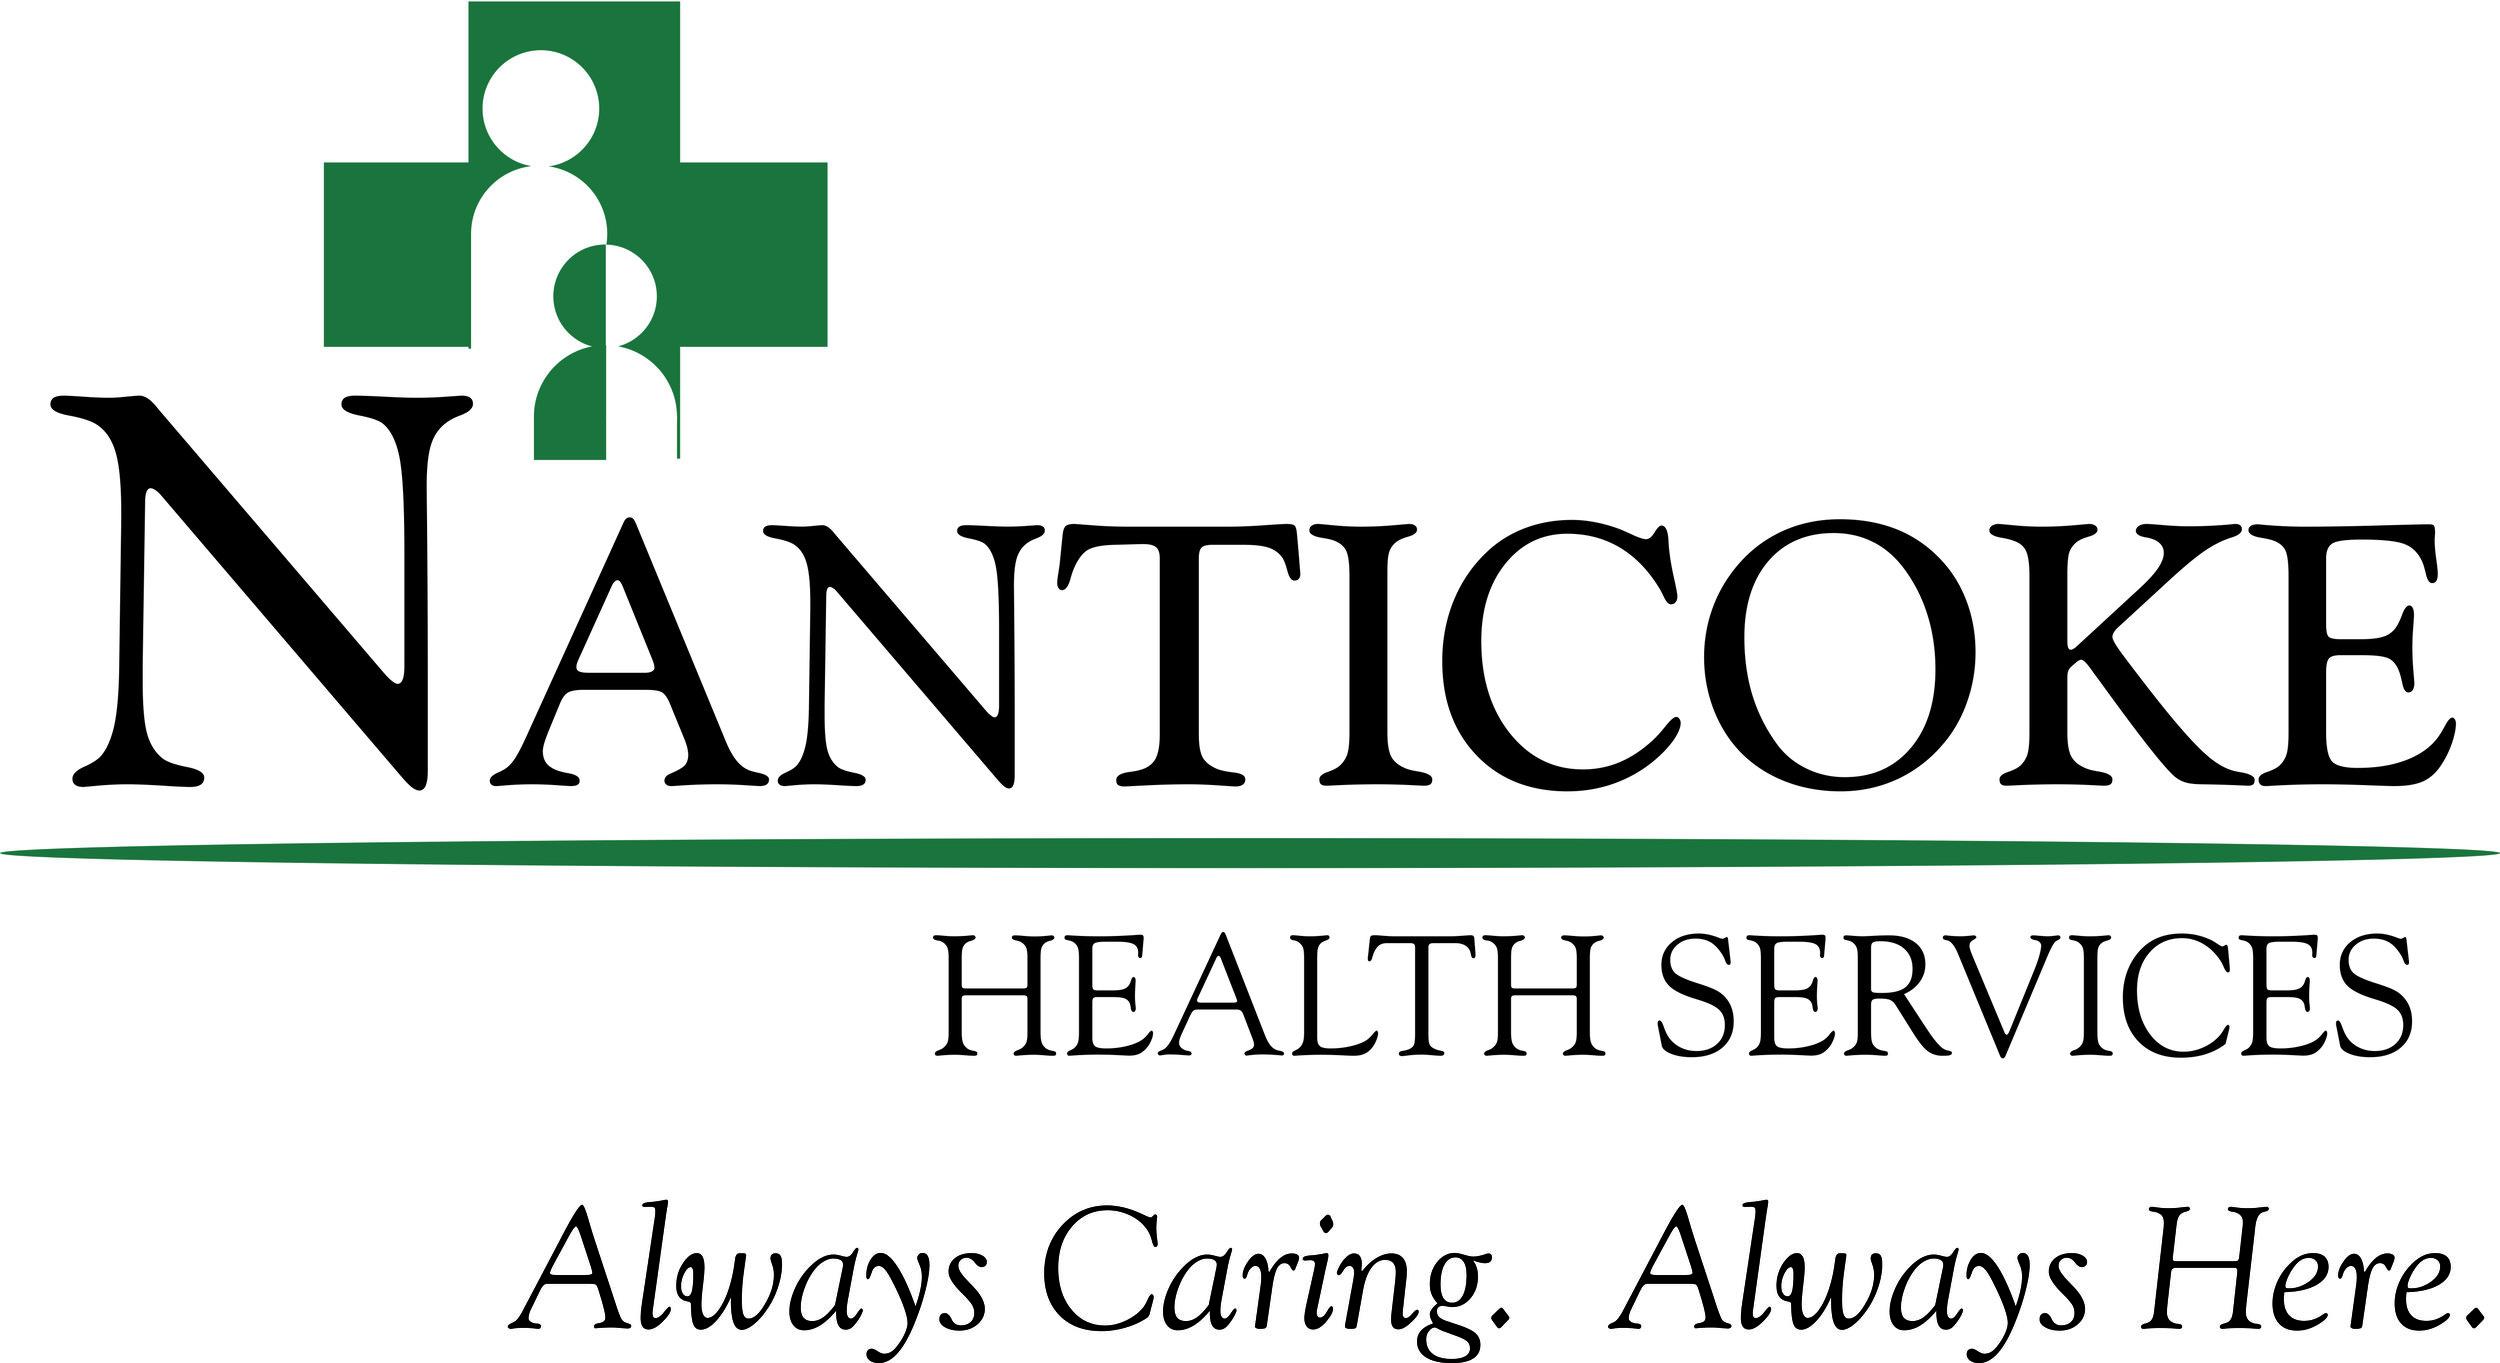 Nanticoke Health Services